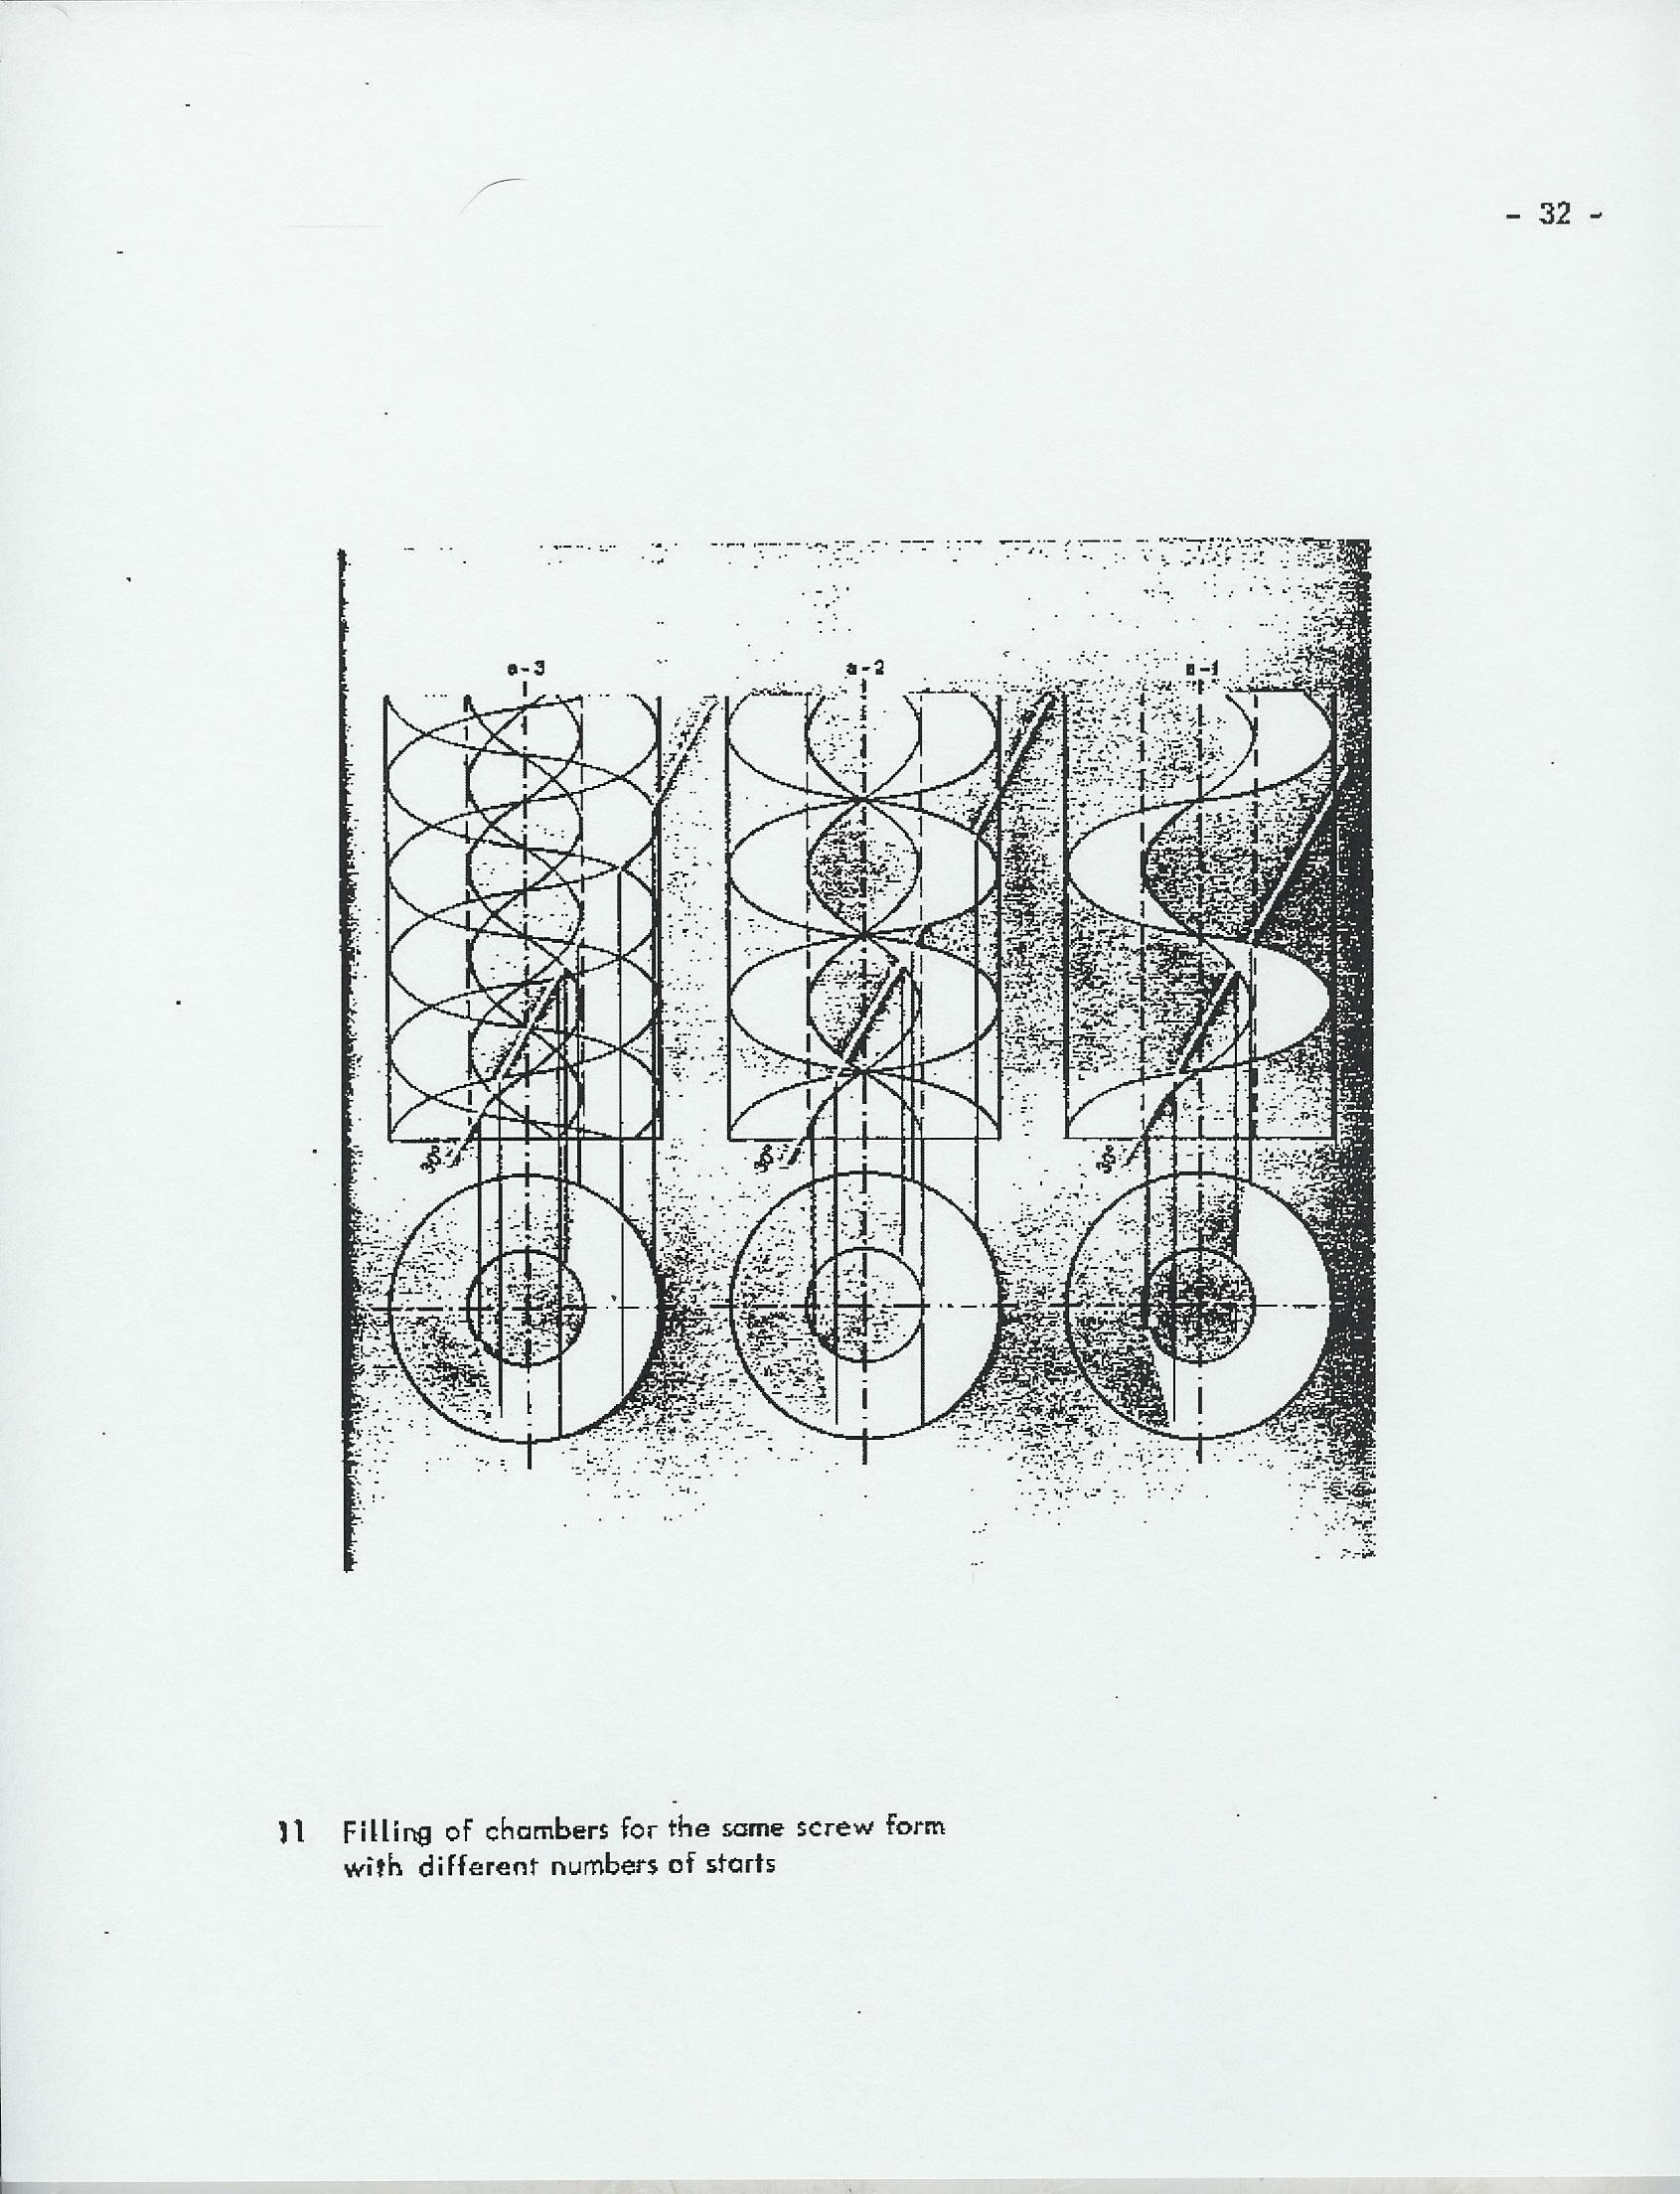 Archimedian Screw Pump Handbook Gerhard Nagel